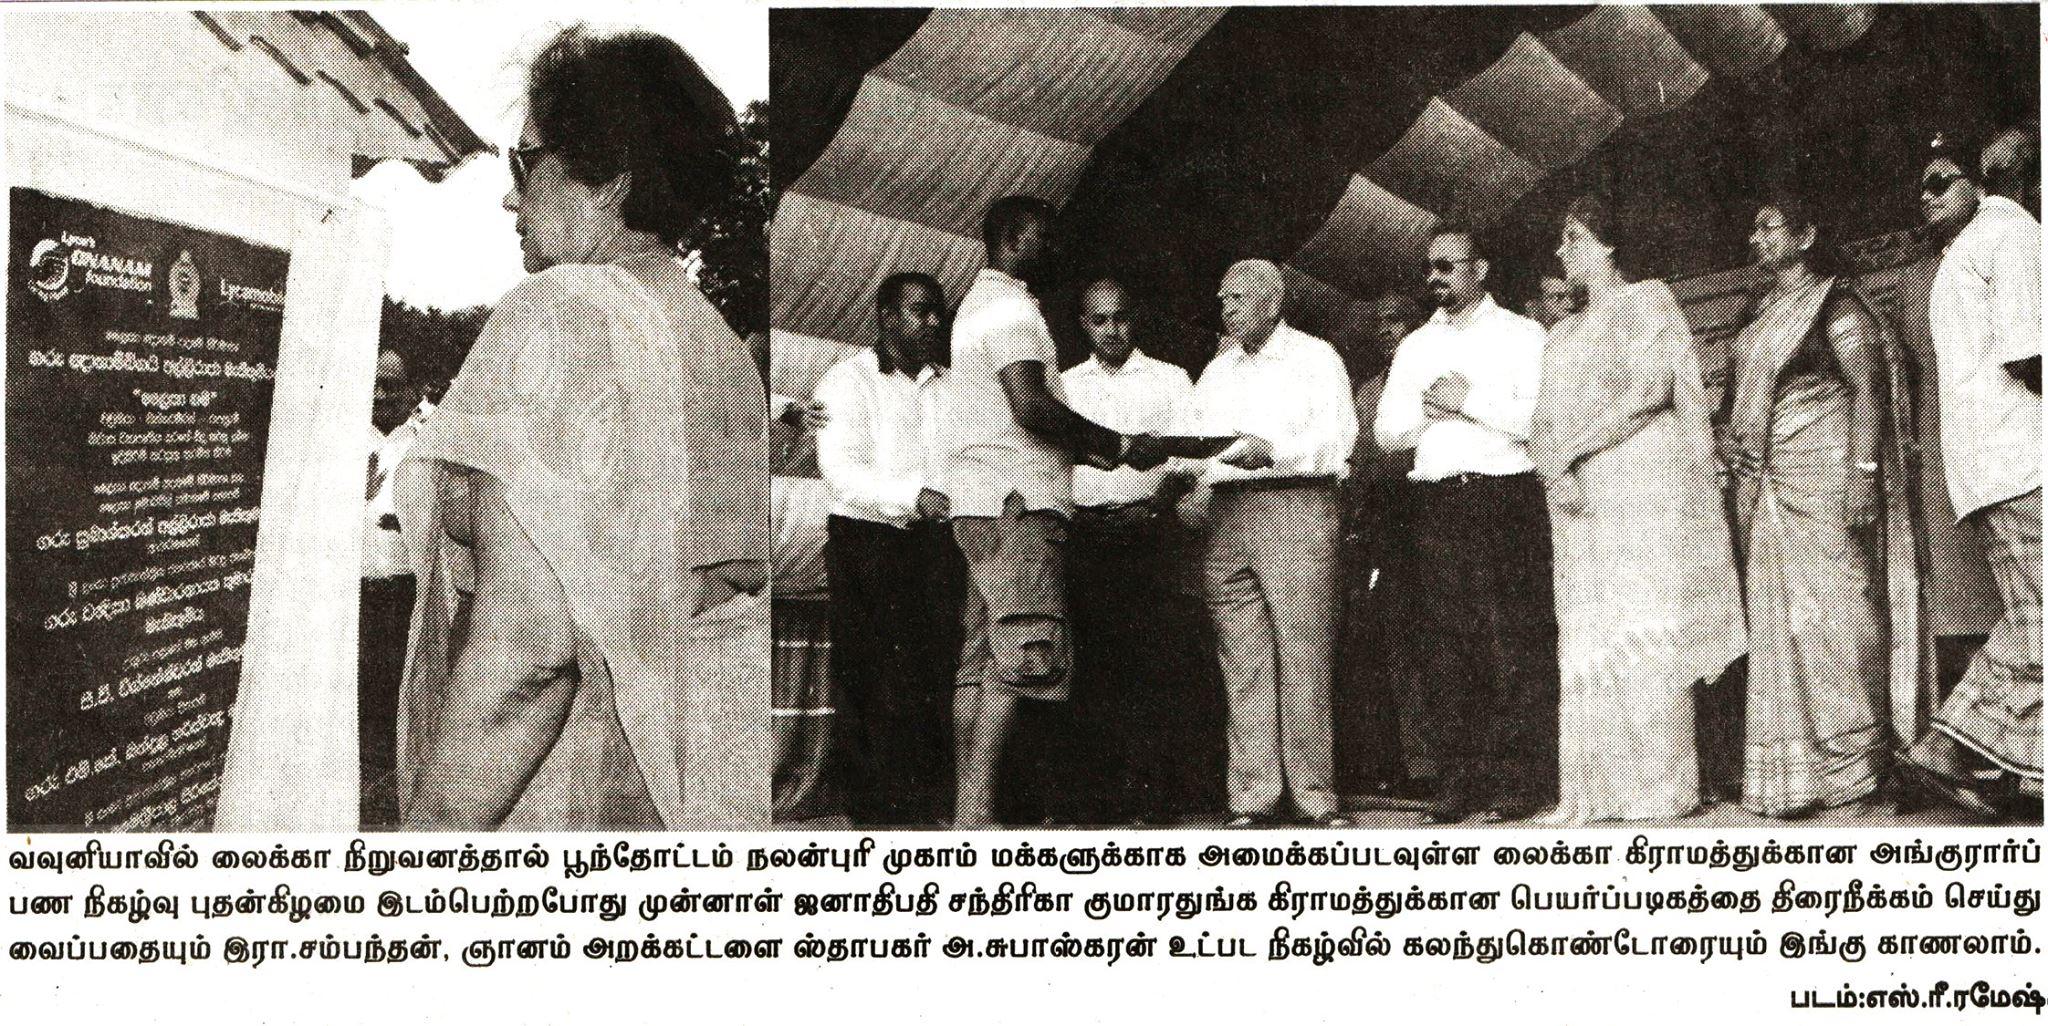 Lyca Village – Gnanam Foundation